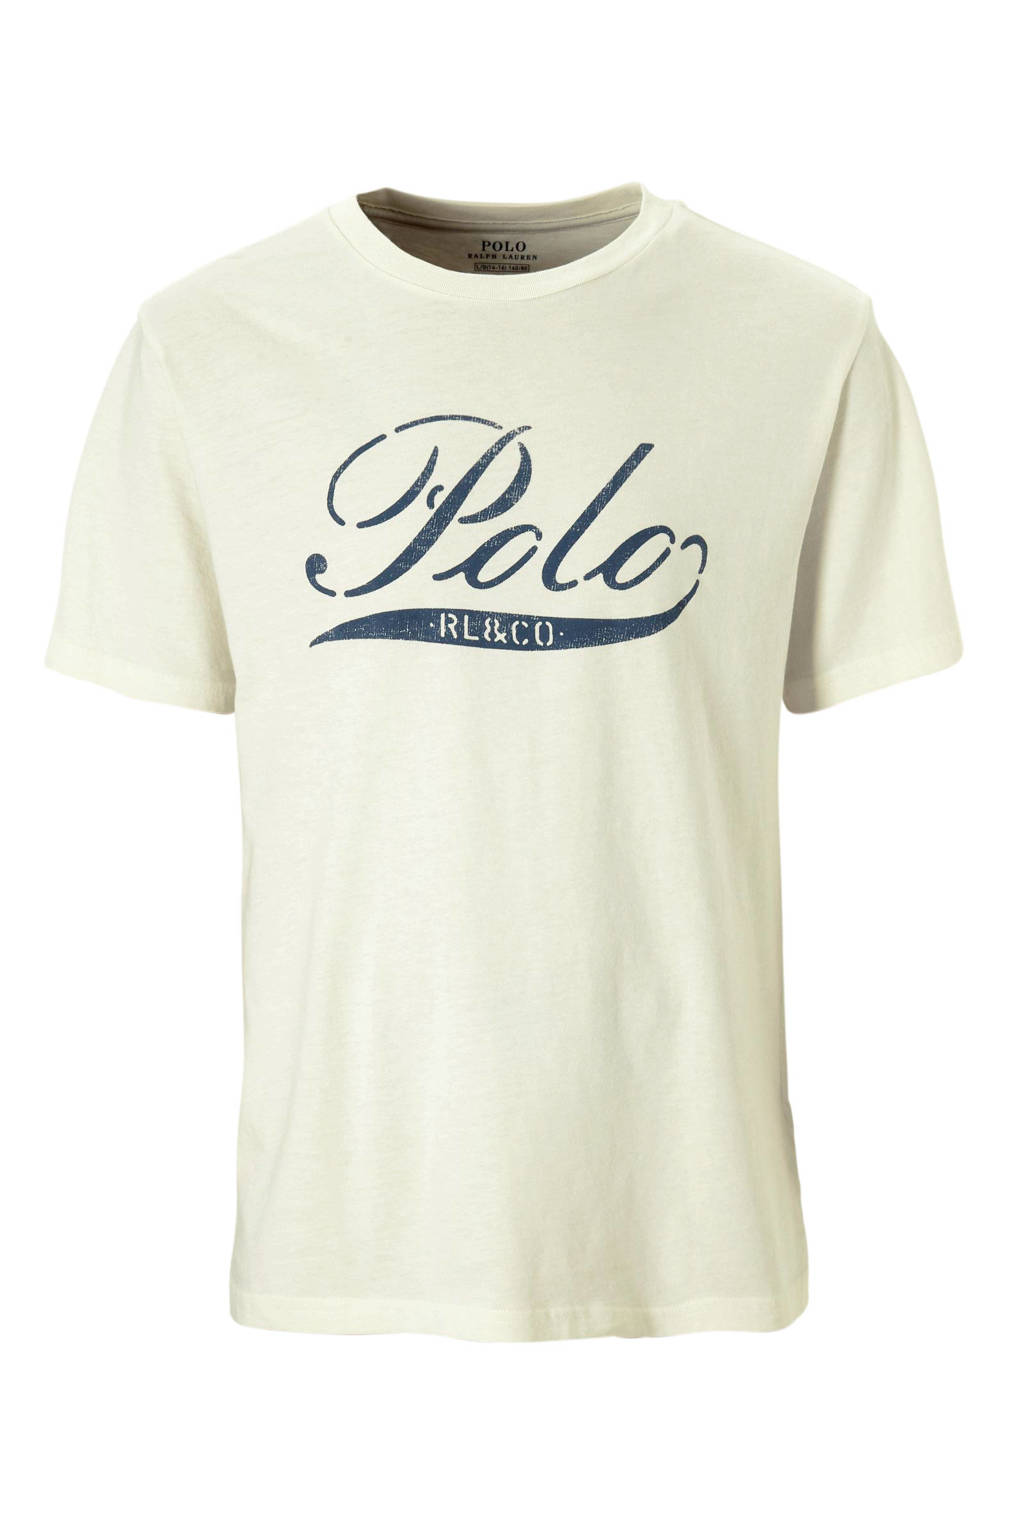 POLO Ralph Lauren T-shirt met logo ecru, Ecru